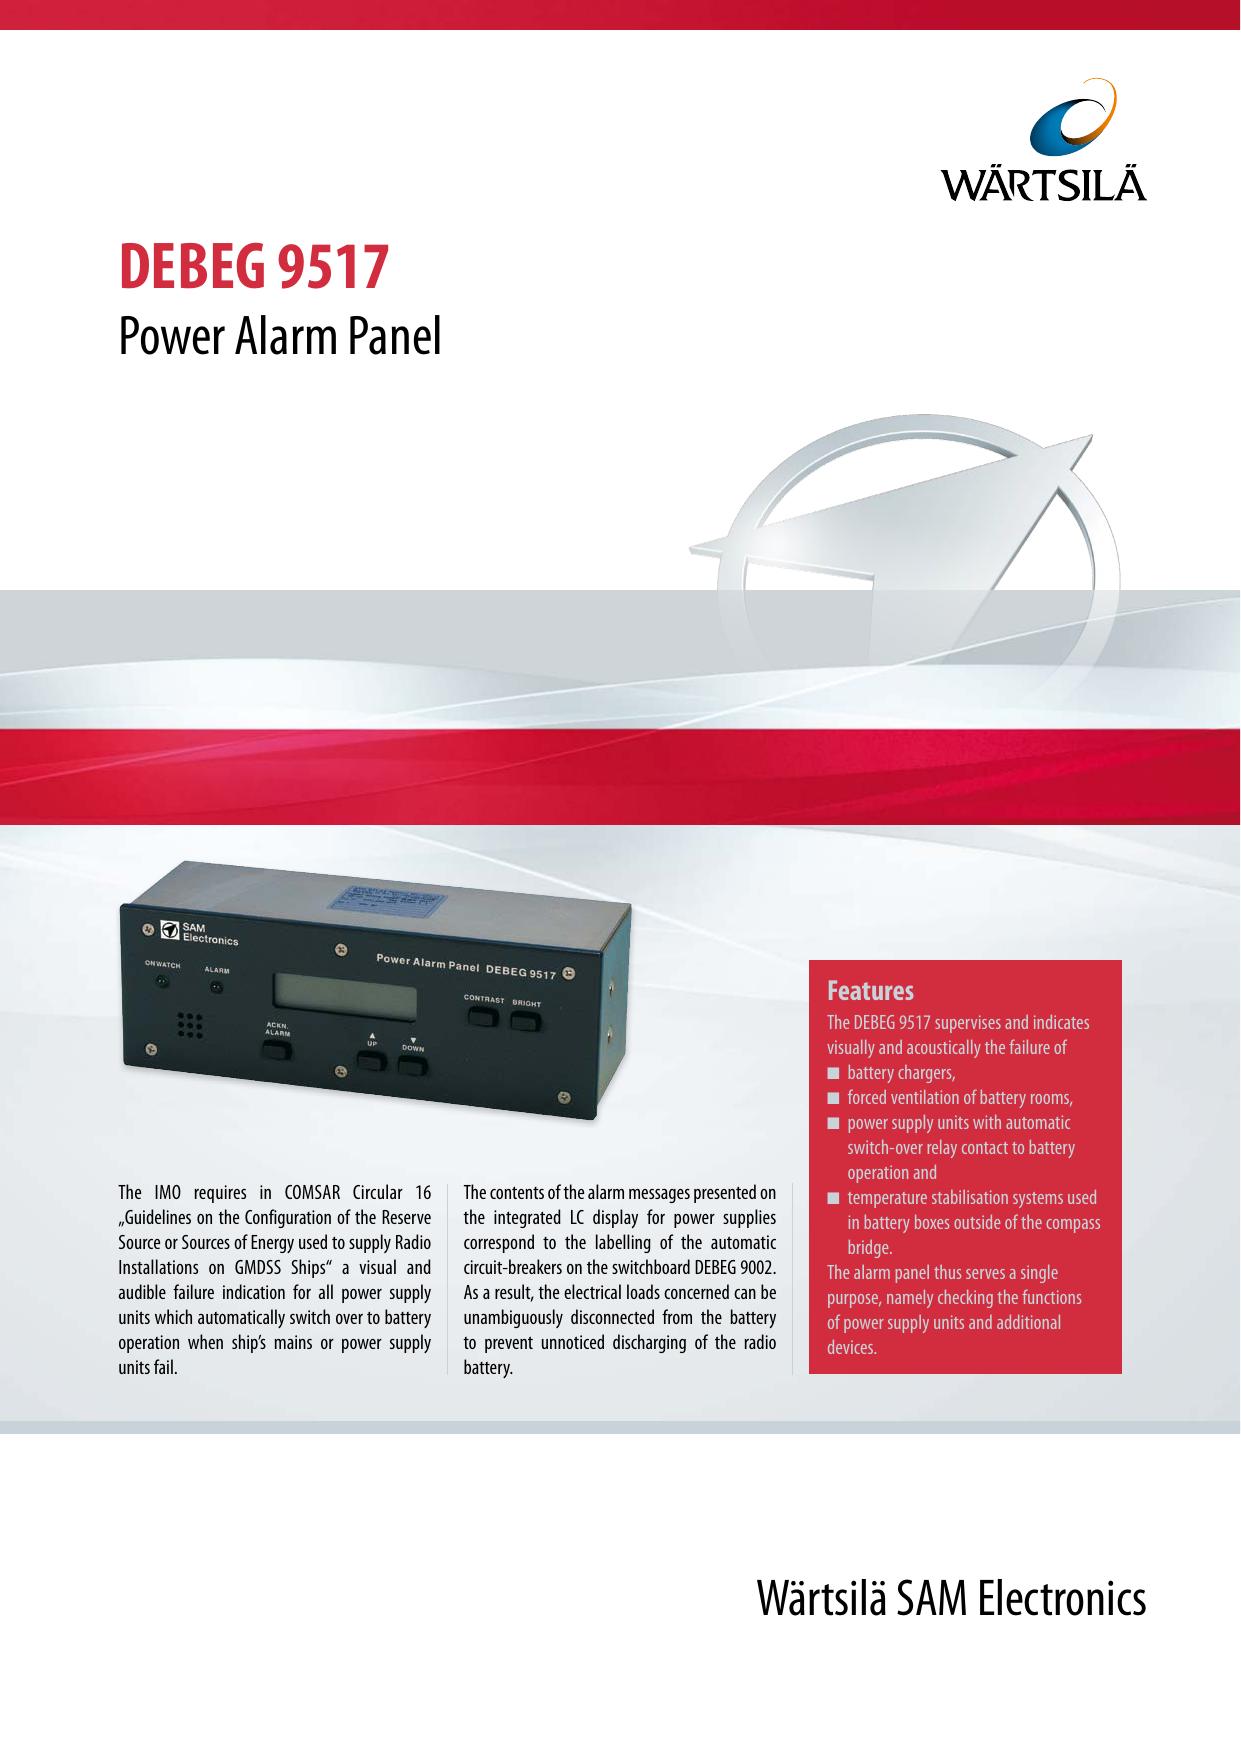 Debeg 9517 Wrtsil Sam Electronics Power Switchover Relay